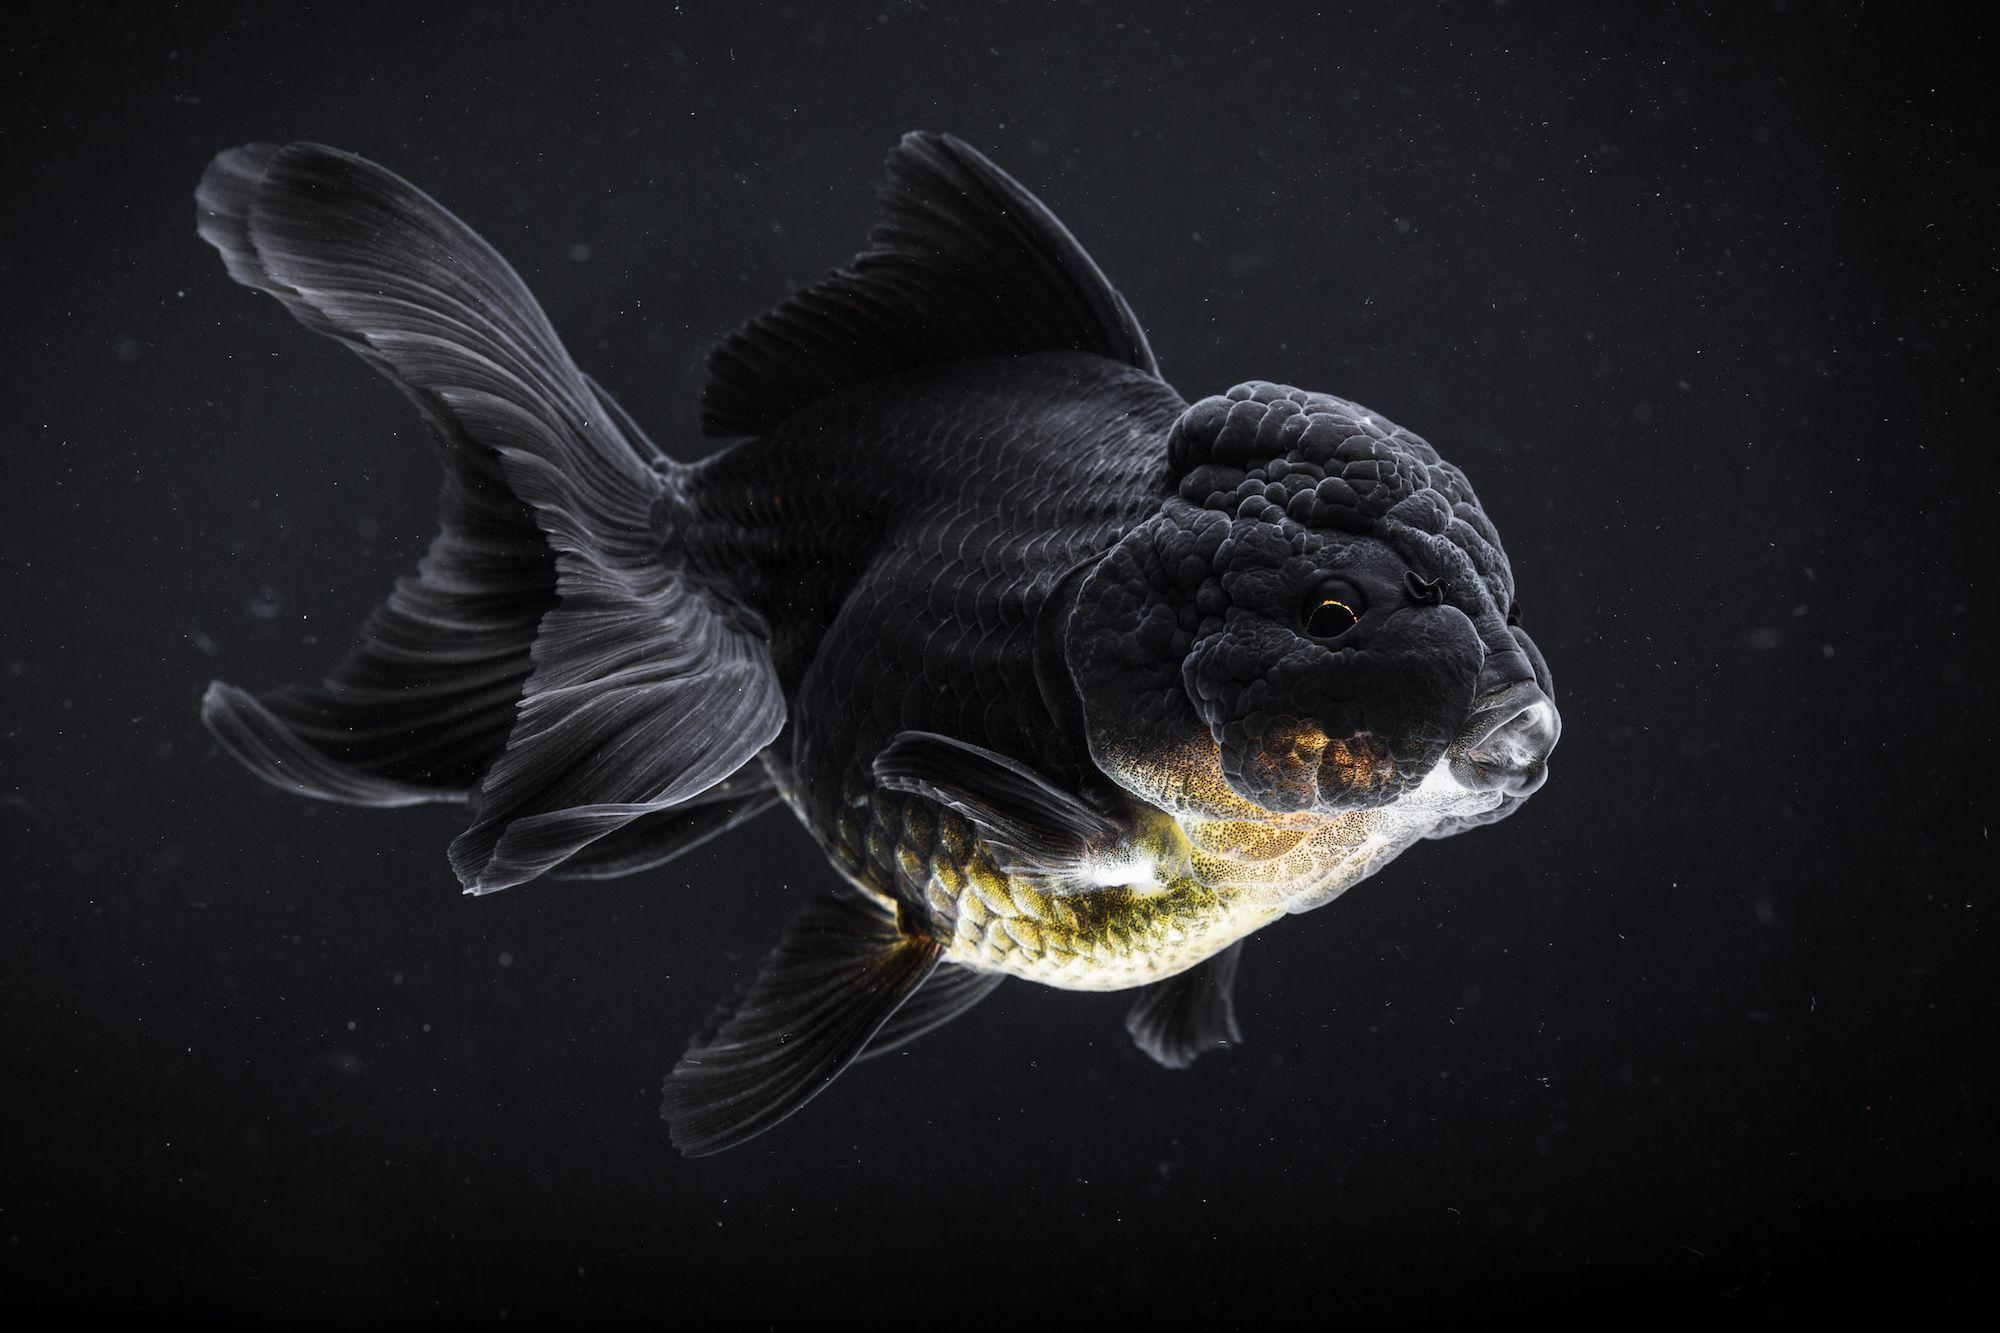 Pin By Raven Coenen On Animals In 2020 Rare Fish Ocean Animals Animals